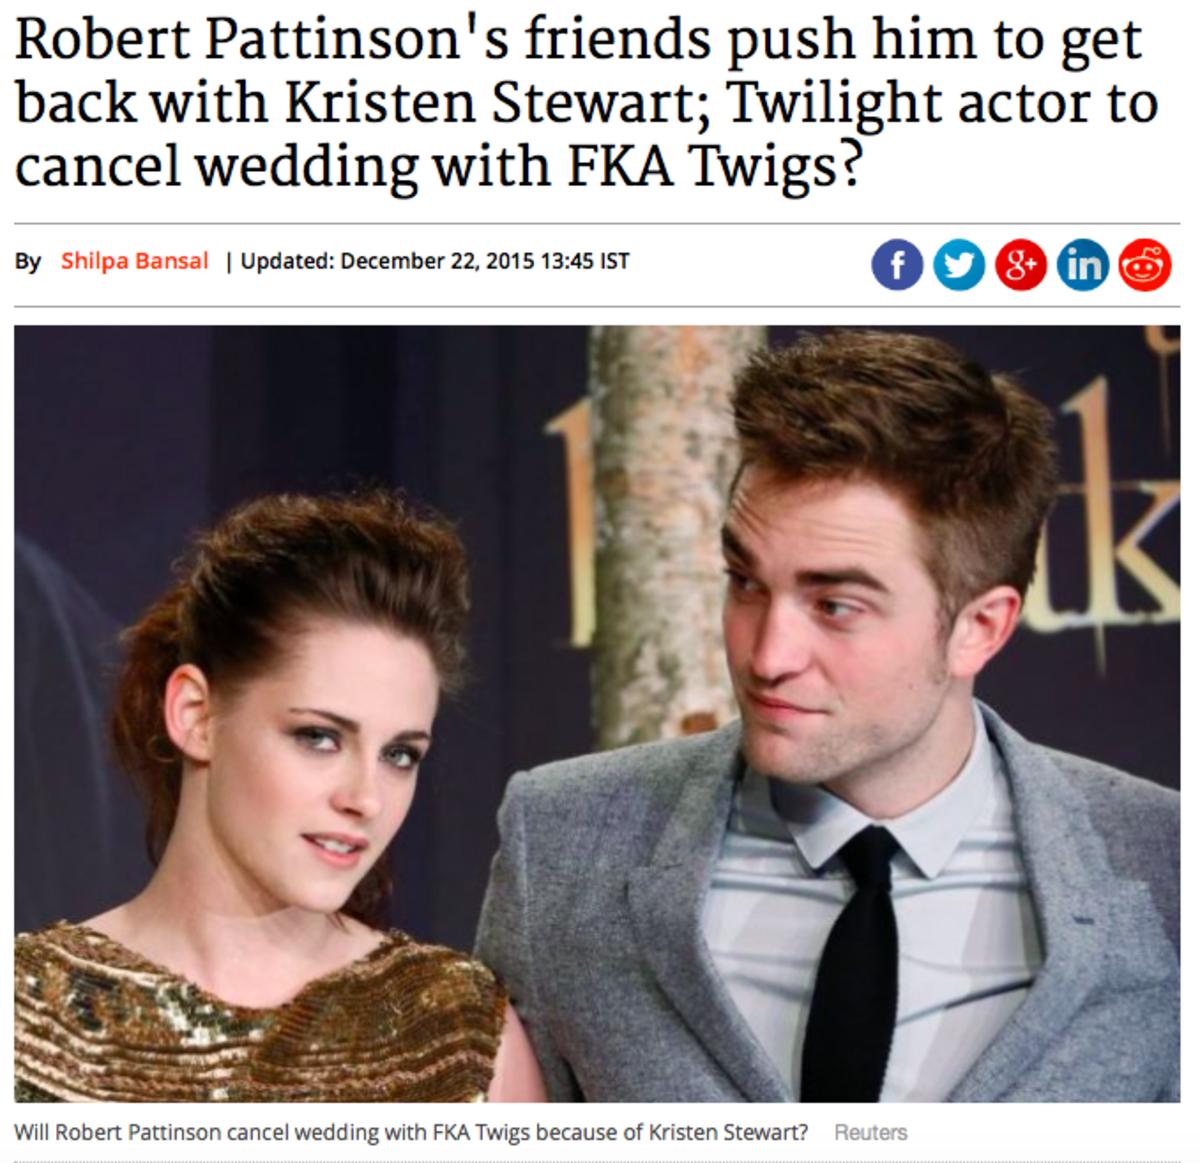 Kristen Stewart, Robert Pattinson & FKA Twigs - Tabloids Harass While OLDER Fans & Anti-Fans Blame Fangirlz for Hate